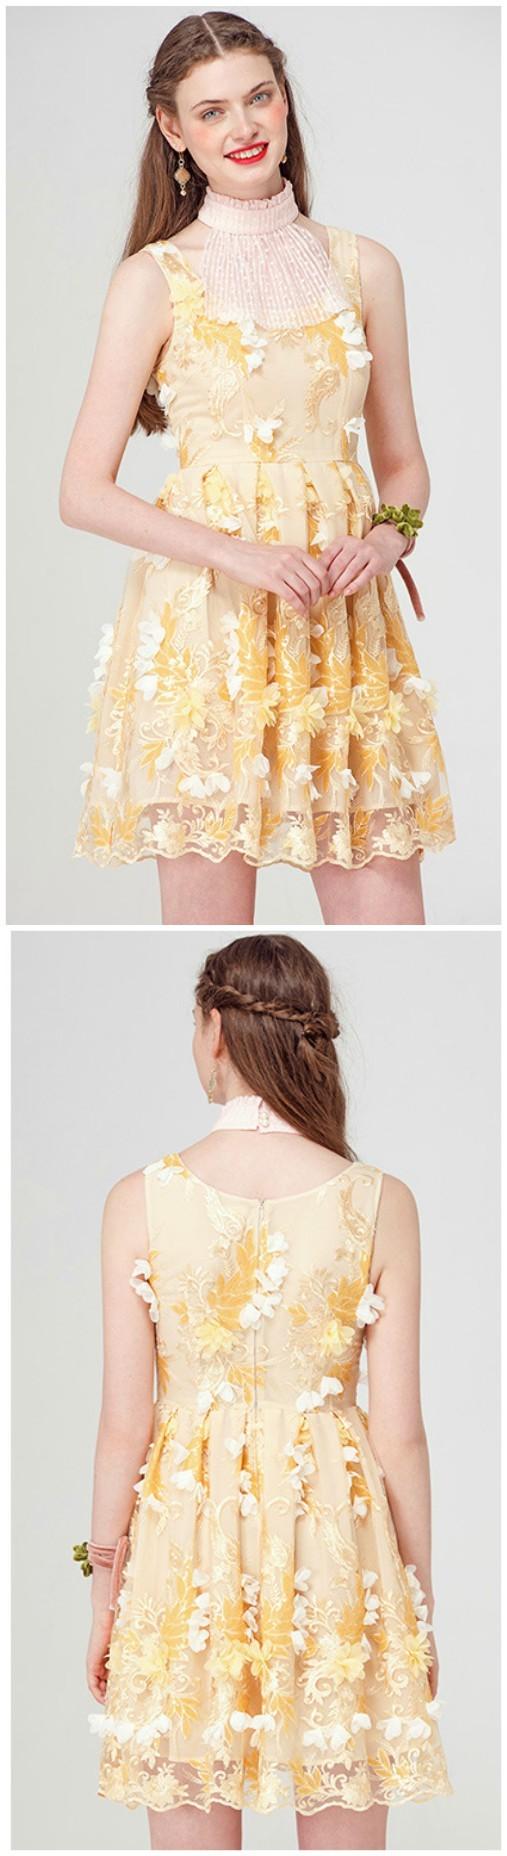 Yellow high neck flowers short party dress flower shorts short